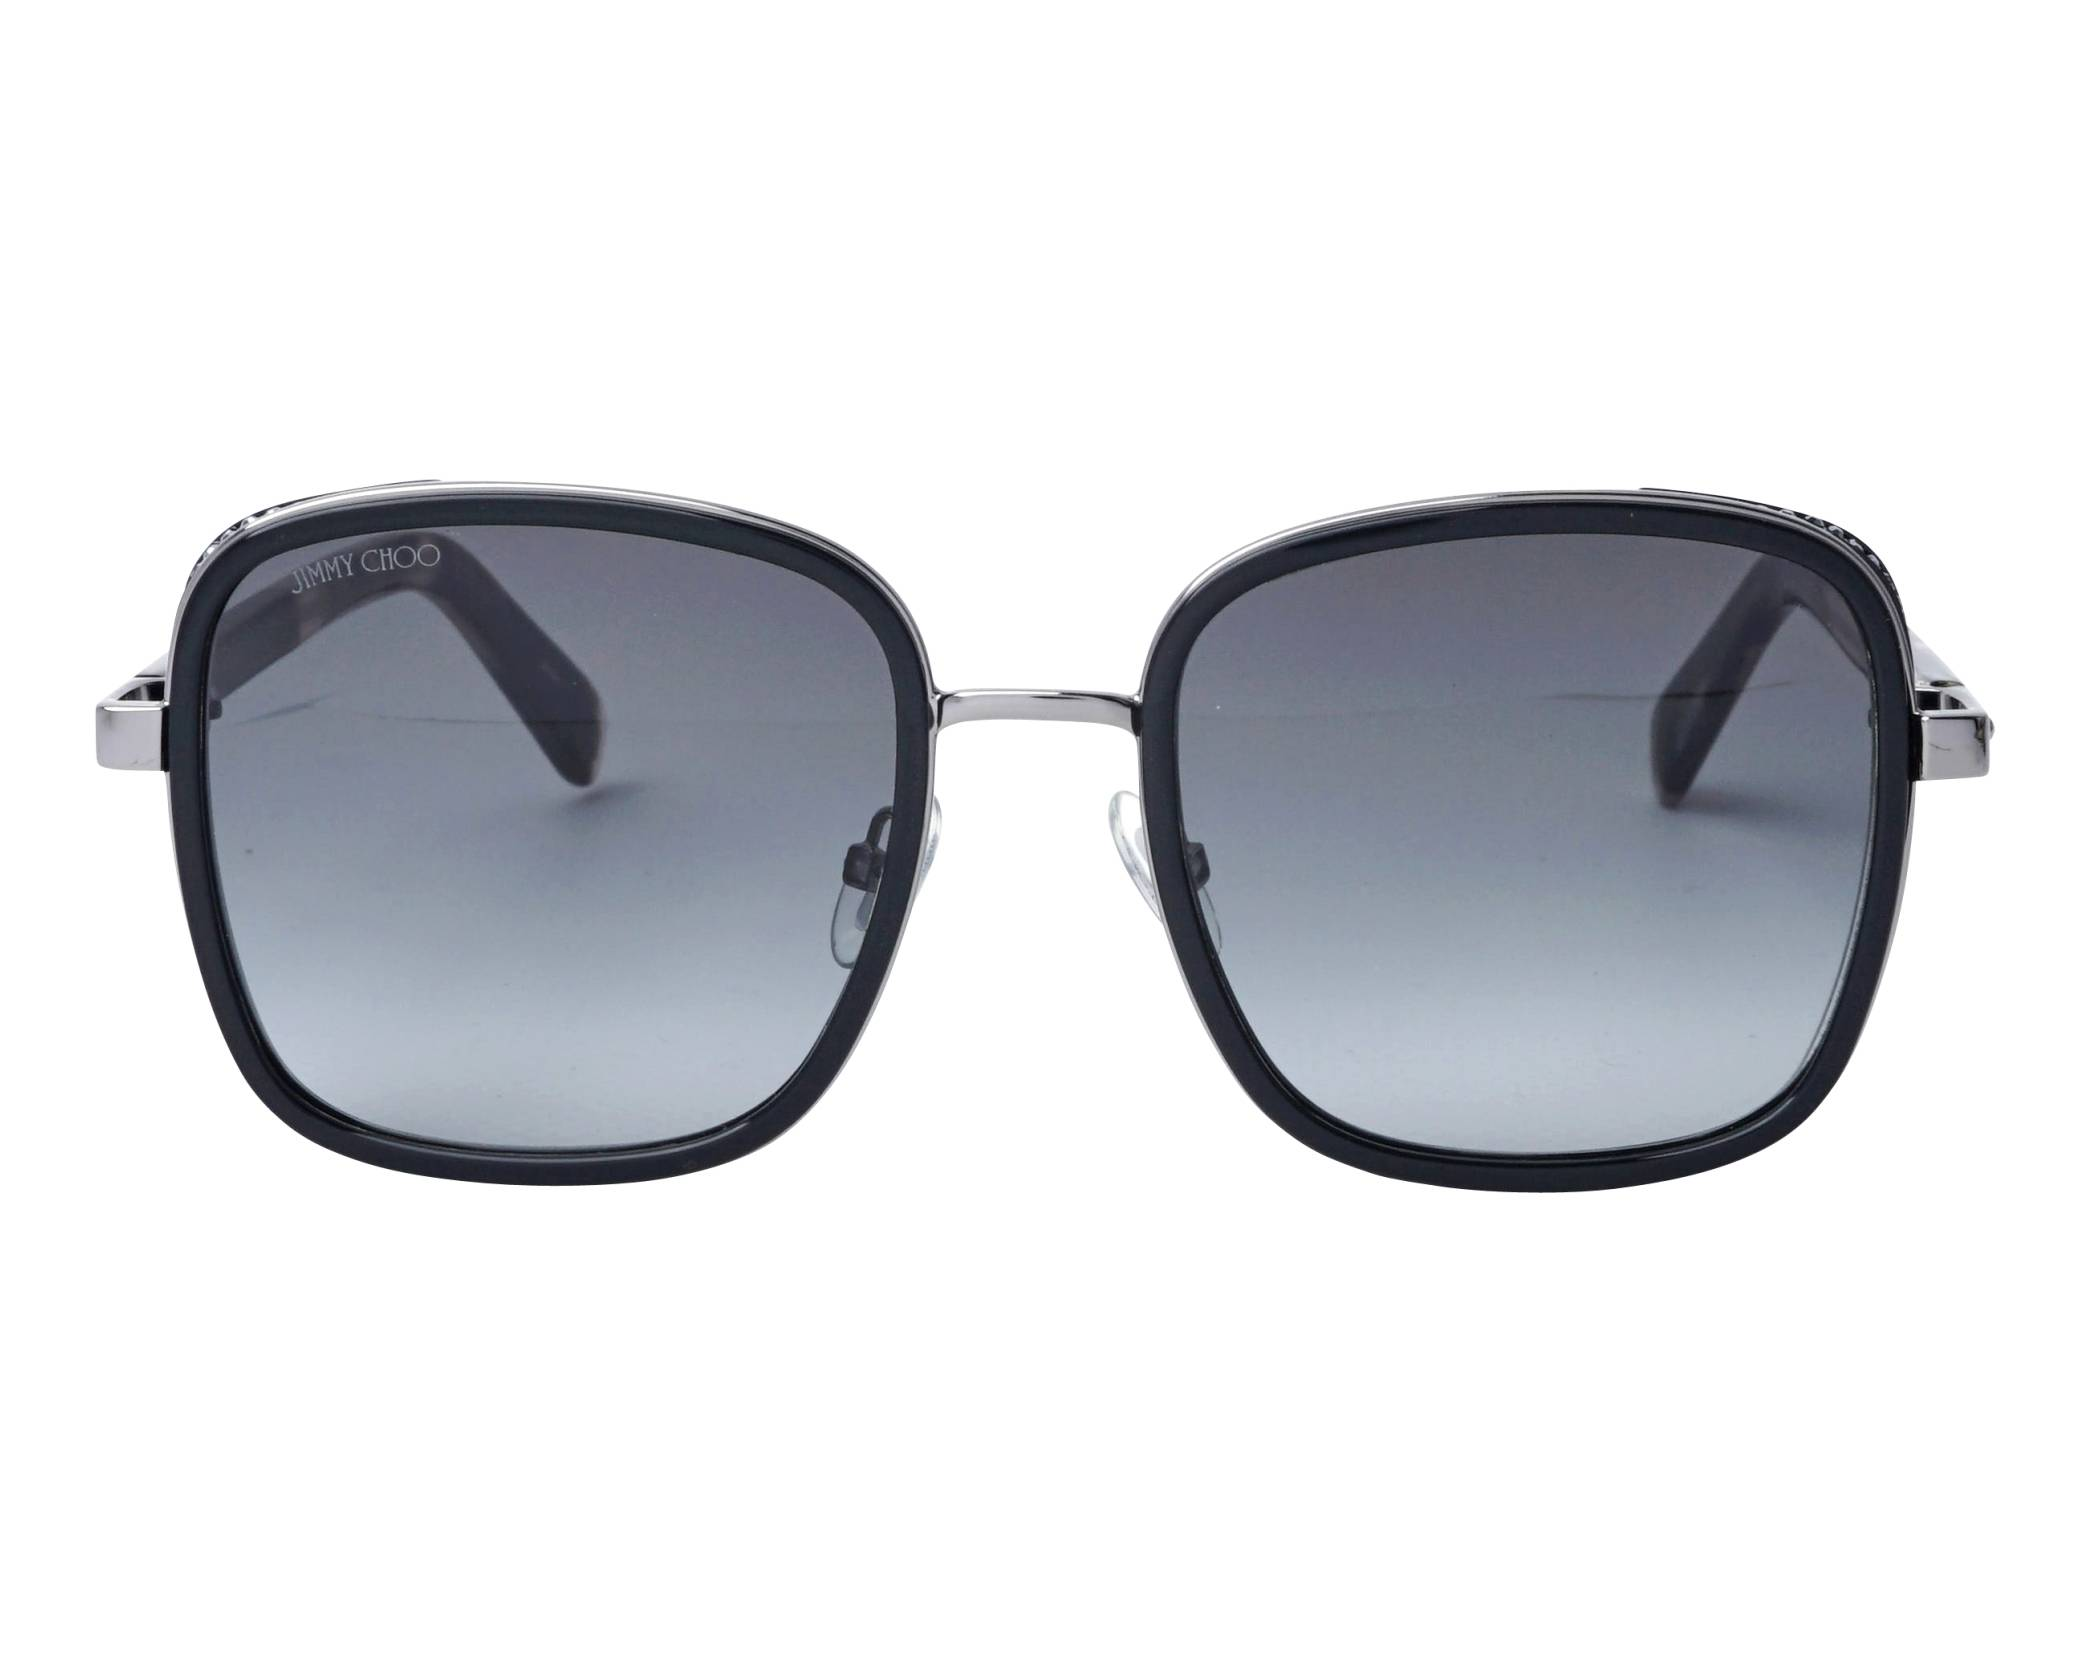 9b139812b83d Sunglasses Jimmy Choo ELVA-S 80790 54-20 Black Gun front view